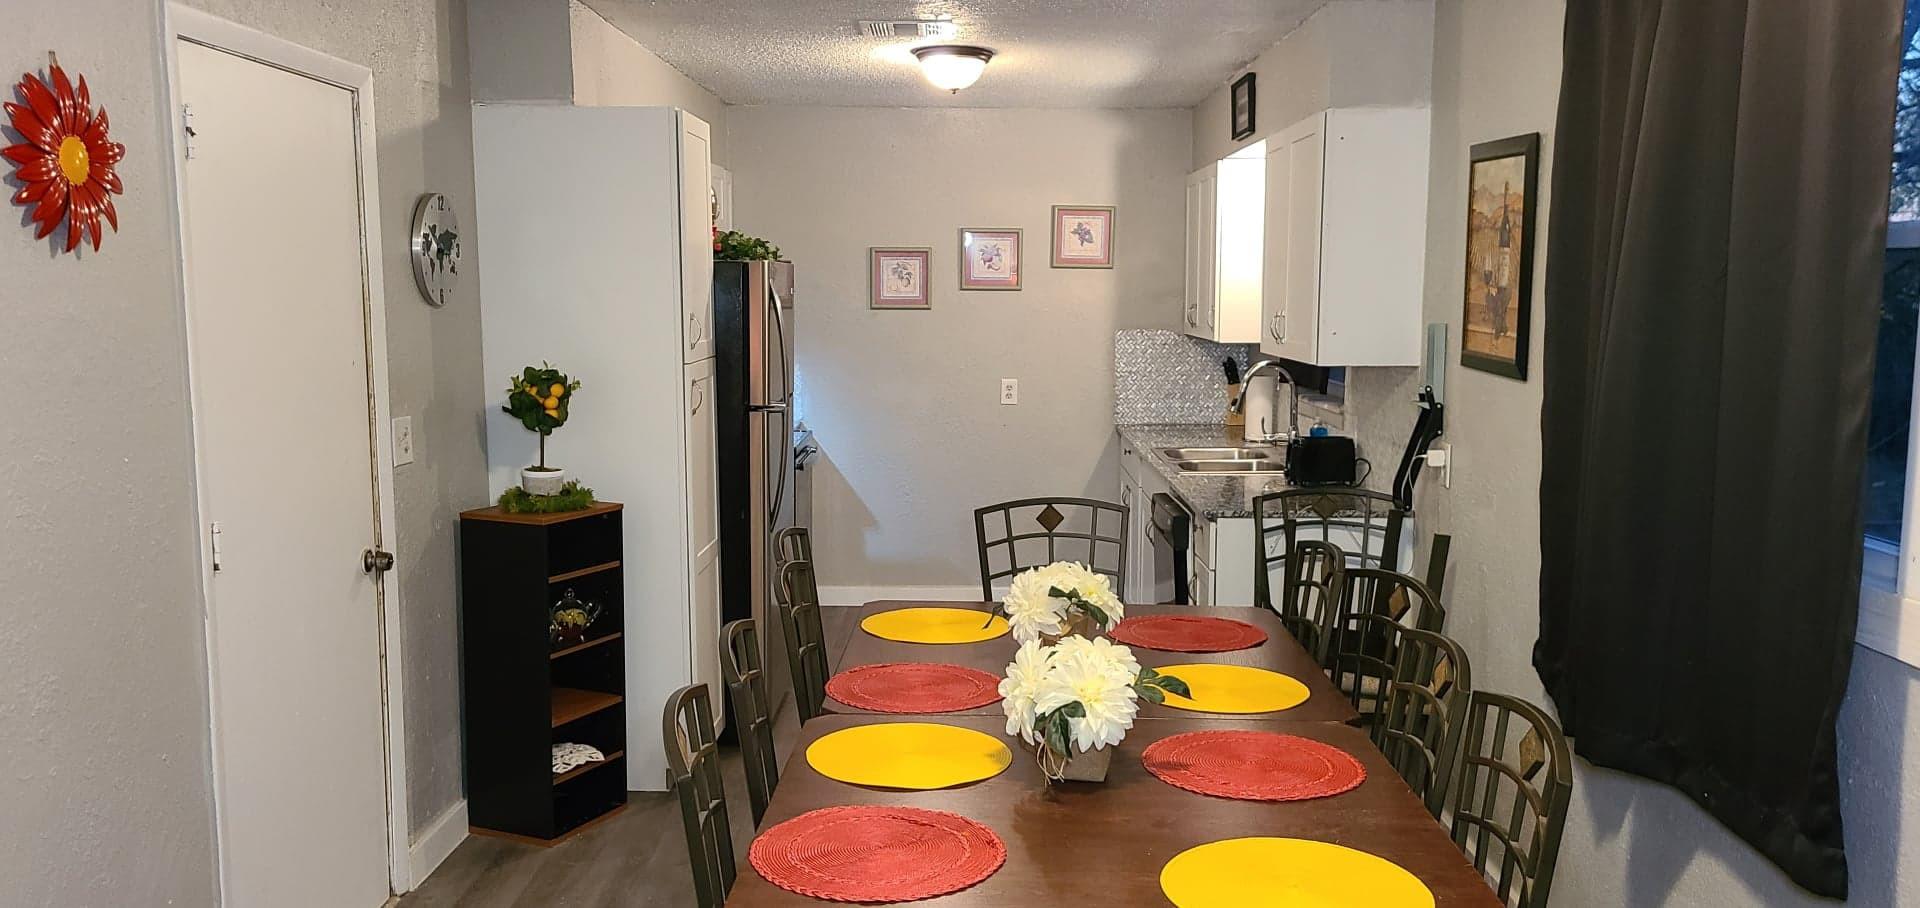 Kitchen table 2.jpg